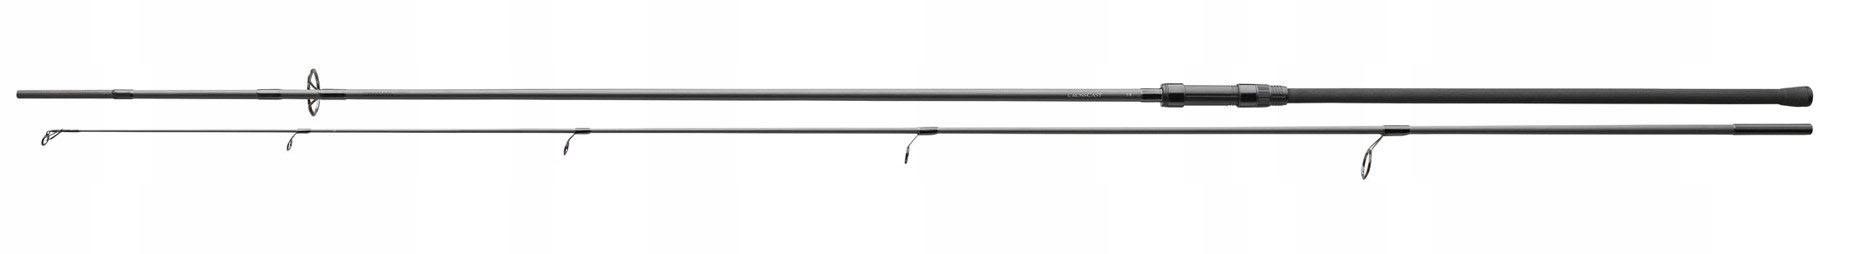 Tyč na Daiwa Crosscast Kapor 3,60 3,50 m lb